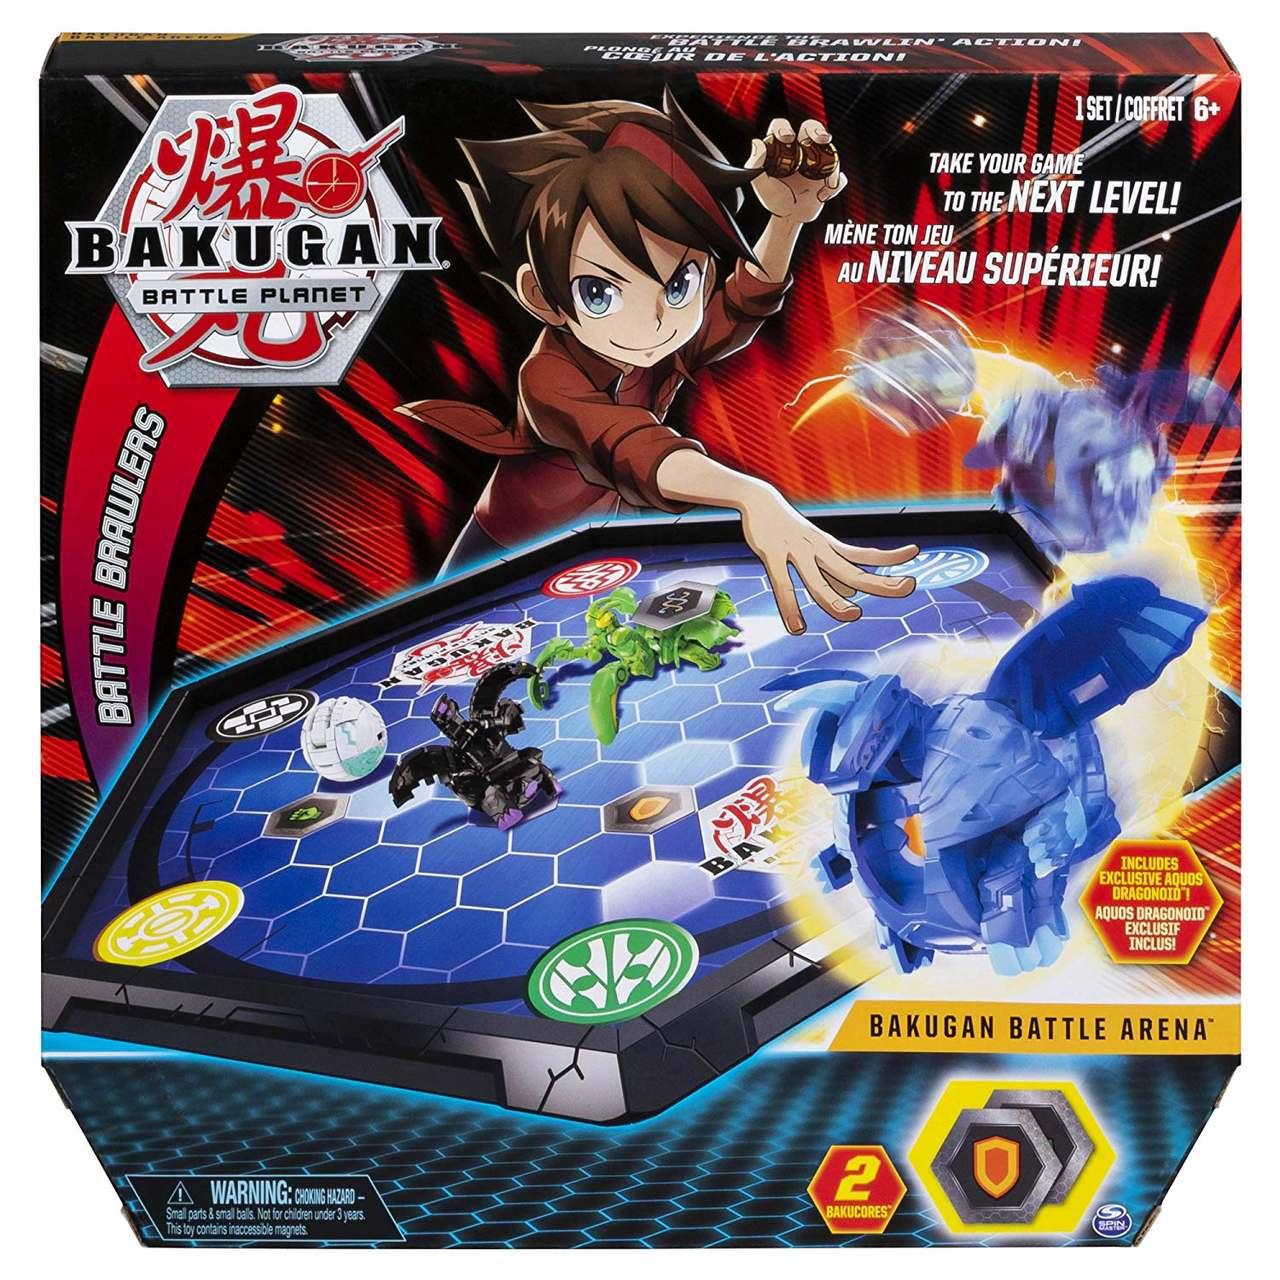 Arena de Batalha Bakugan - Com Aquos Dragonoid - Sunny